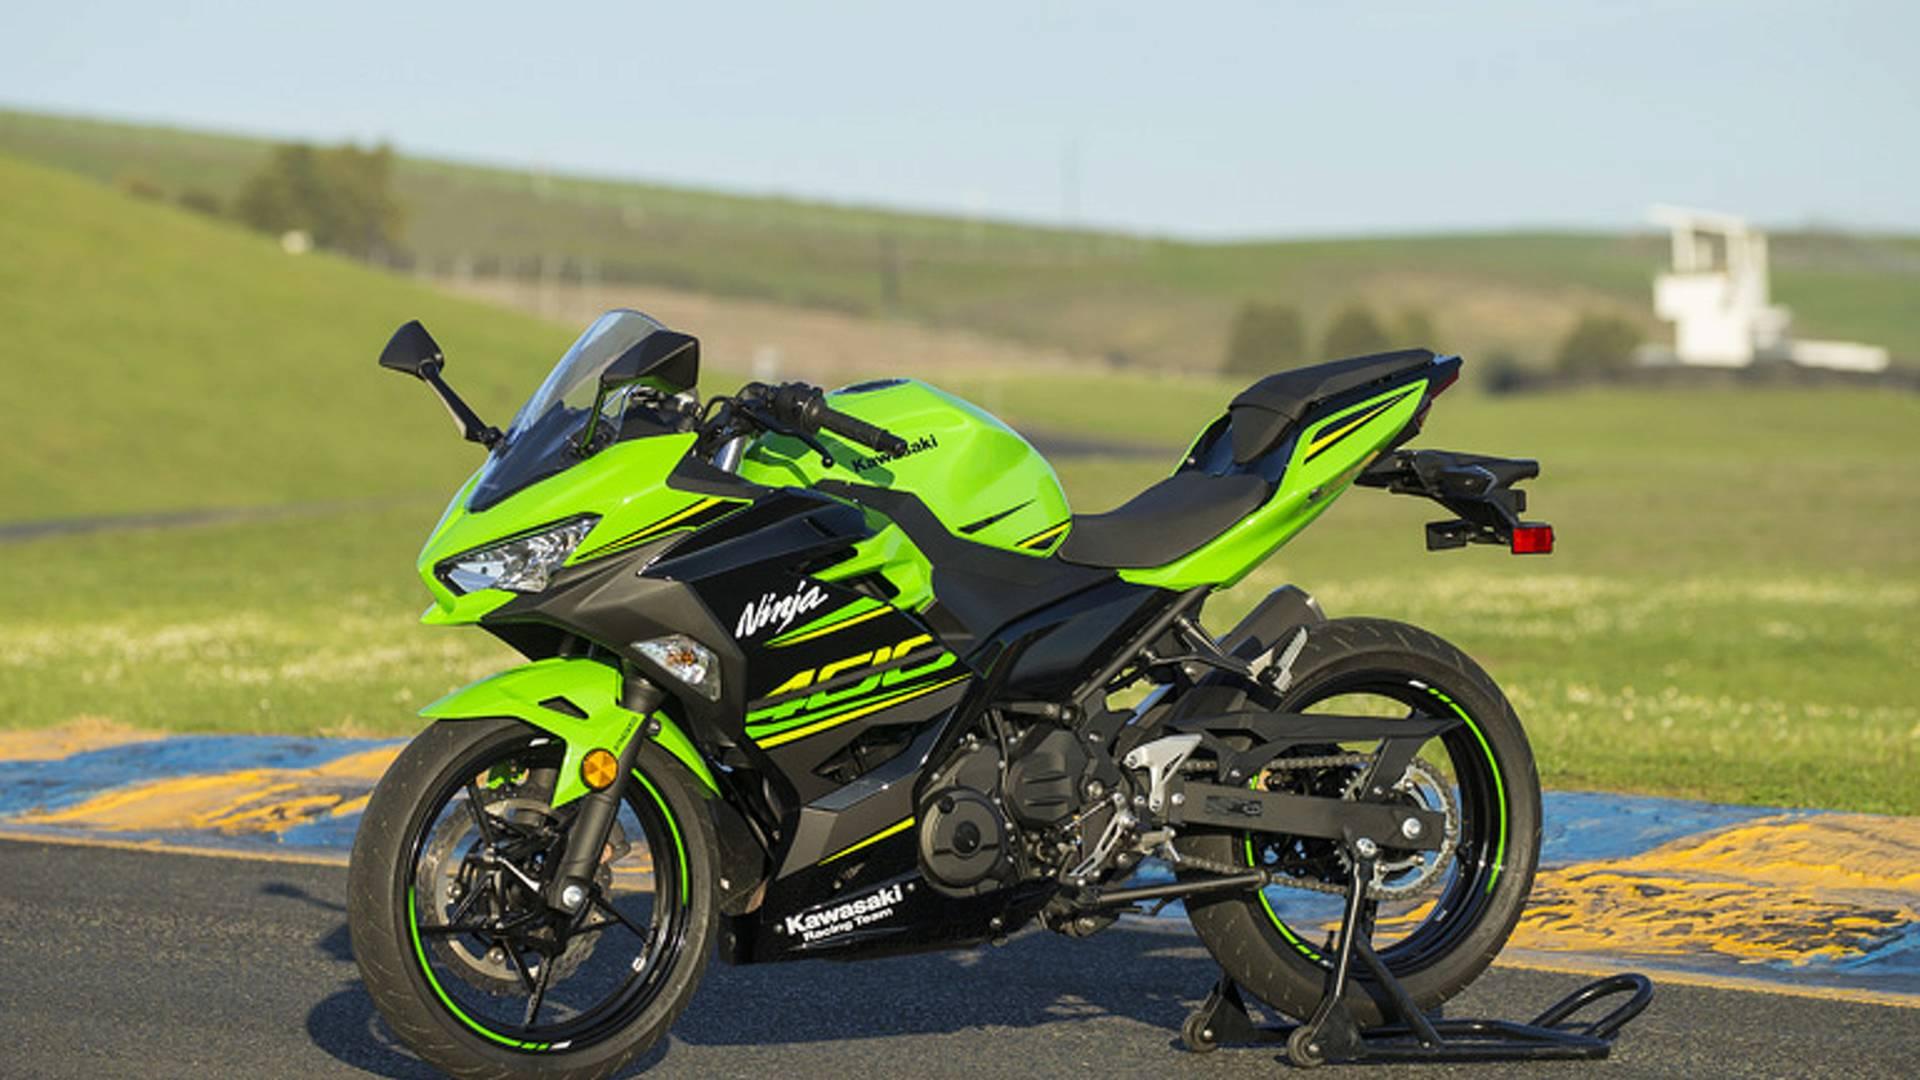 2018 Kawasaki Ninja 400 First Ride Rideapartcom Photos